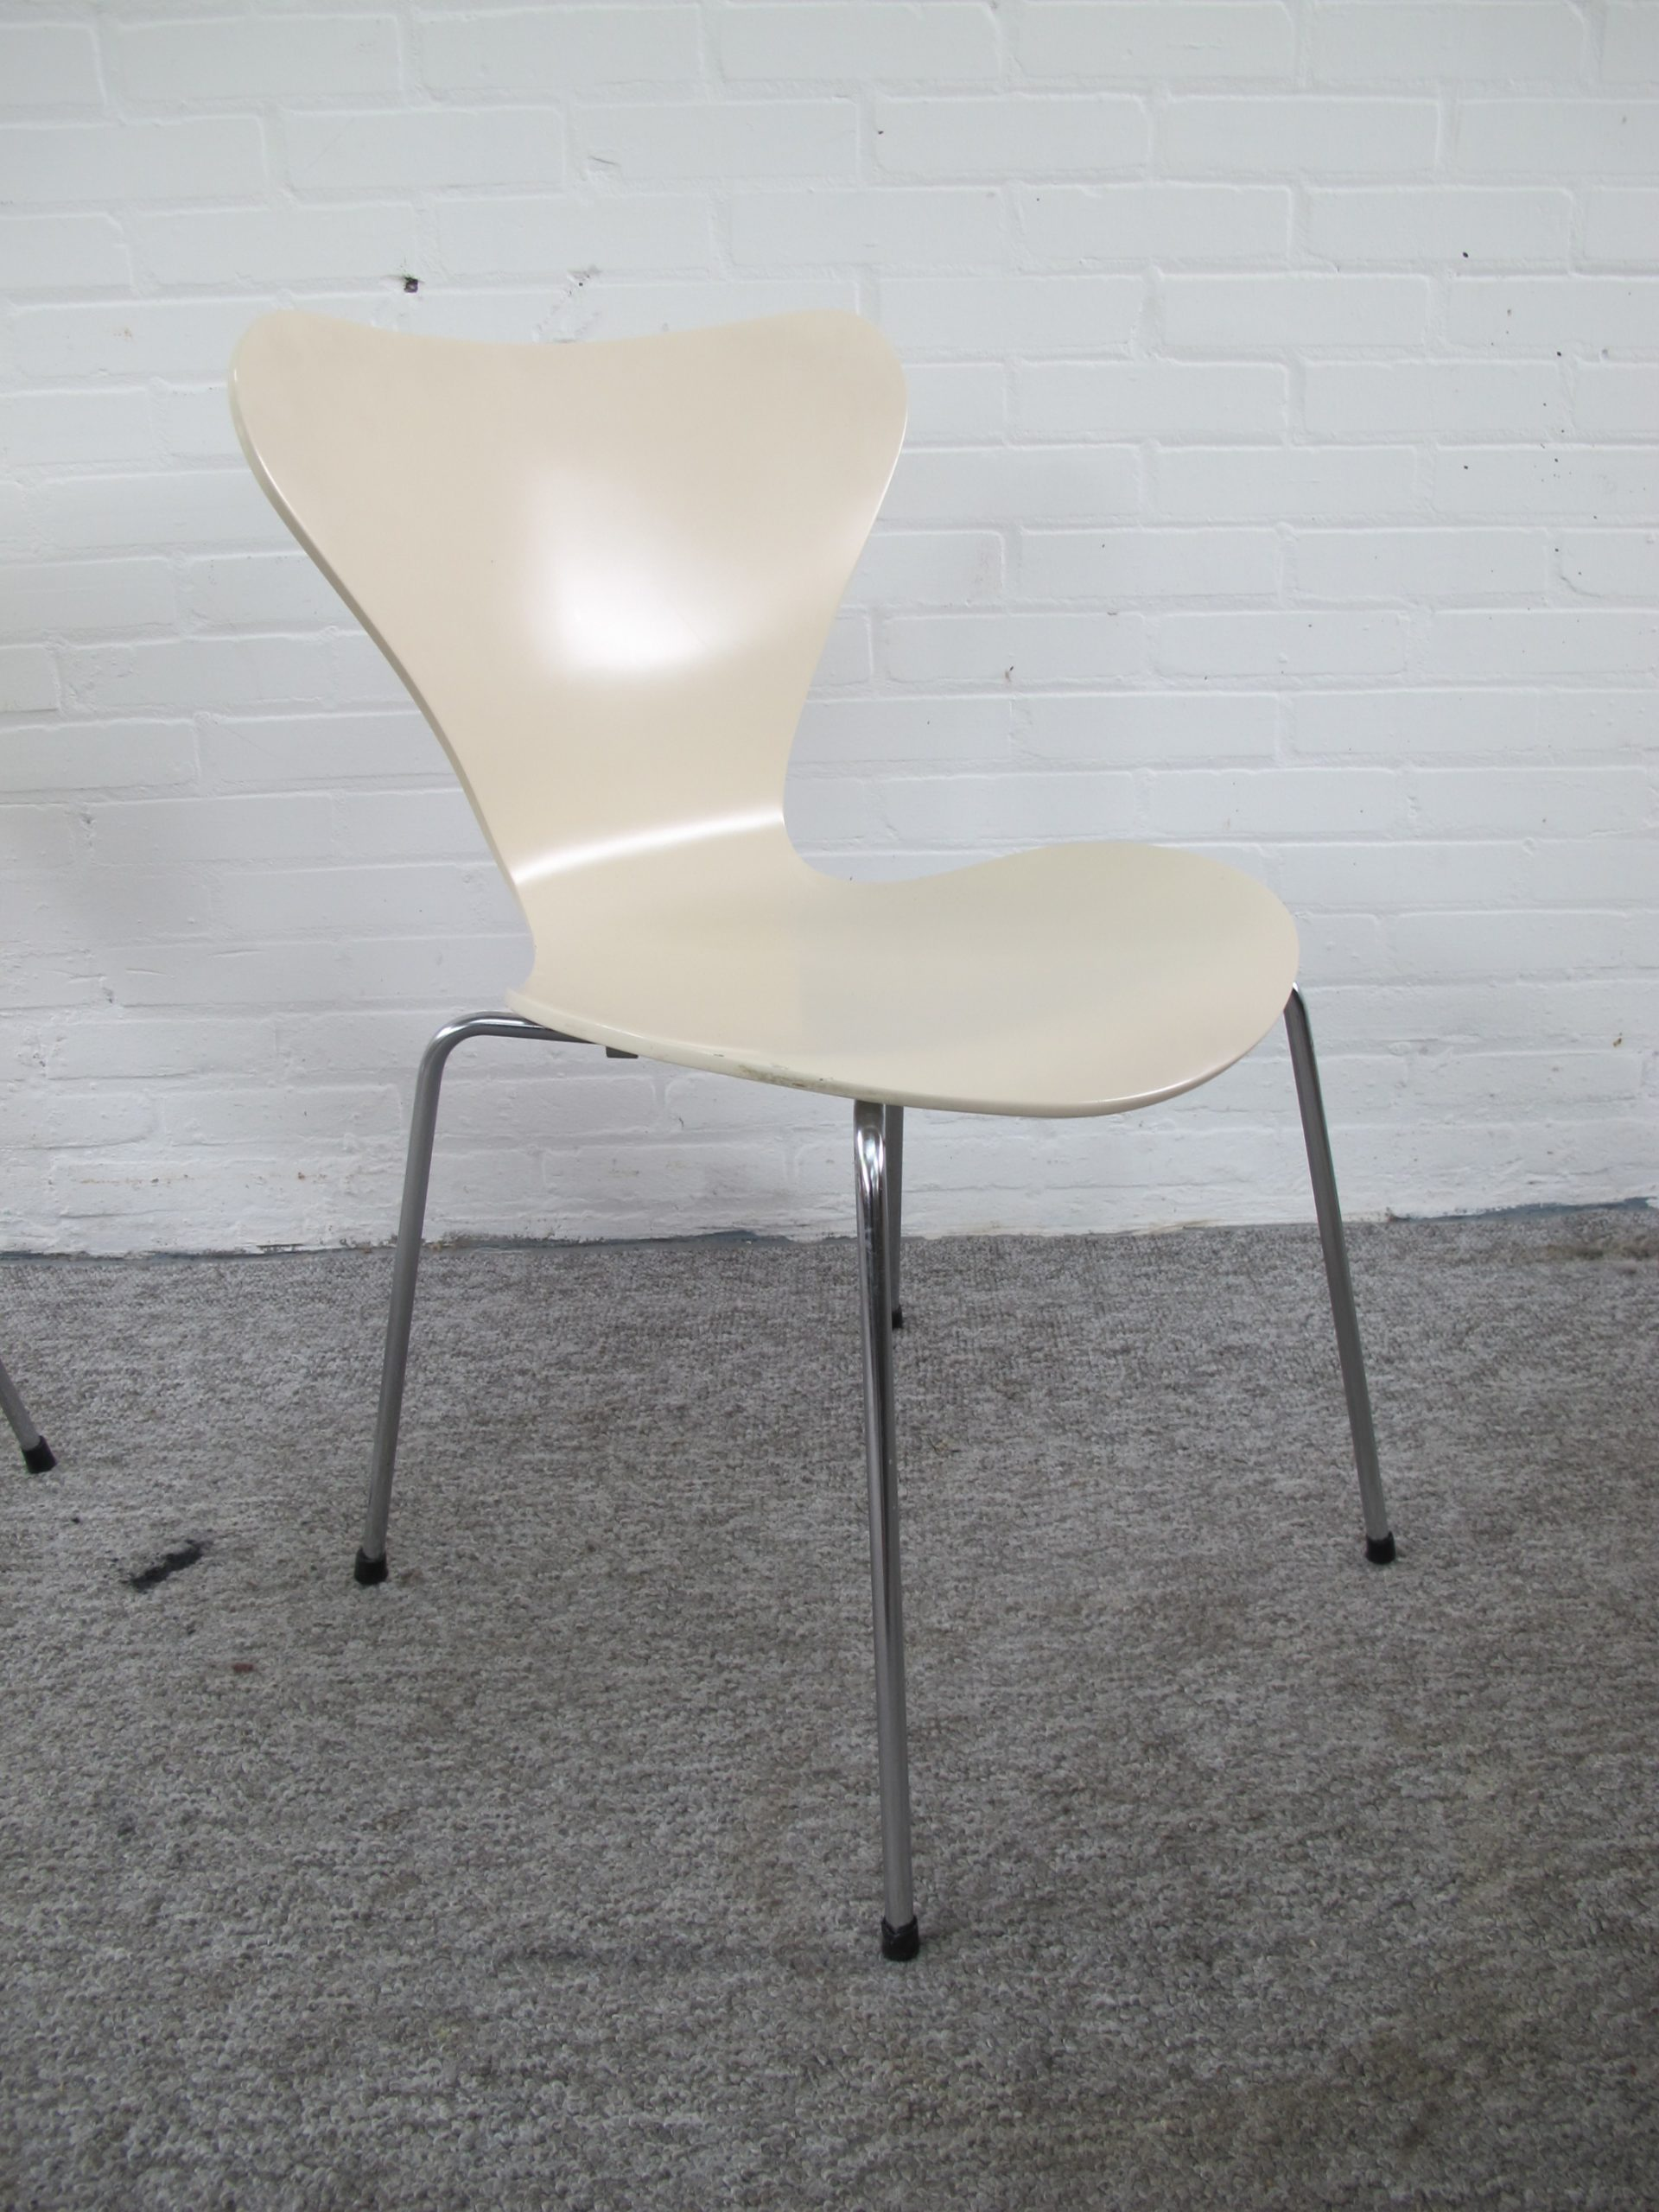 Stoel vlinder stoelen butterfly chairs Arne Jacobsen Fritz Hansen vintage midcentury